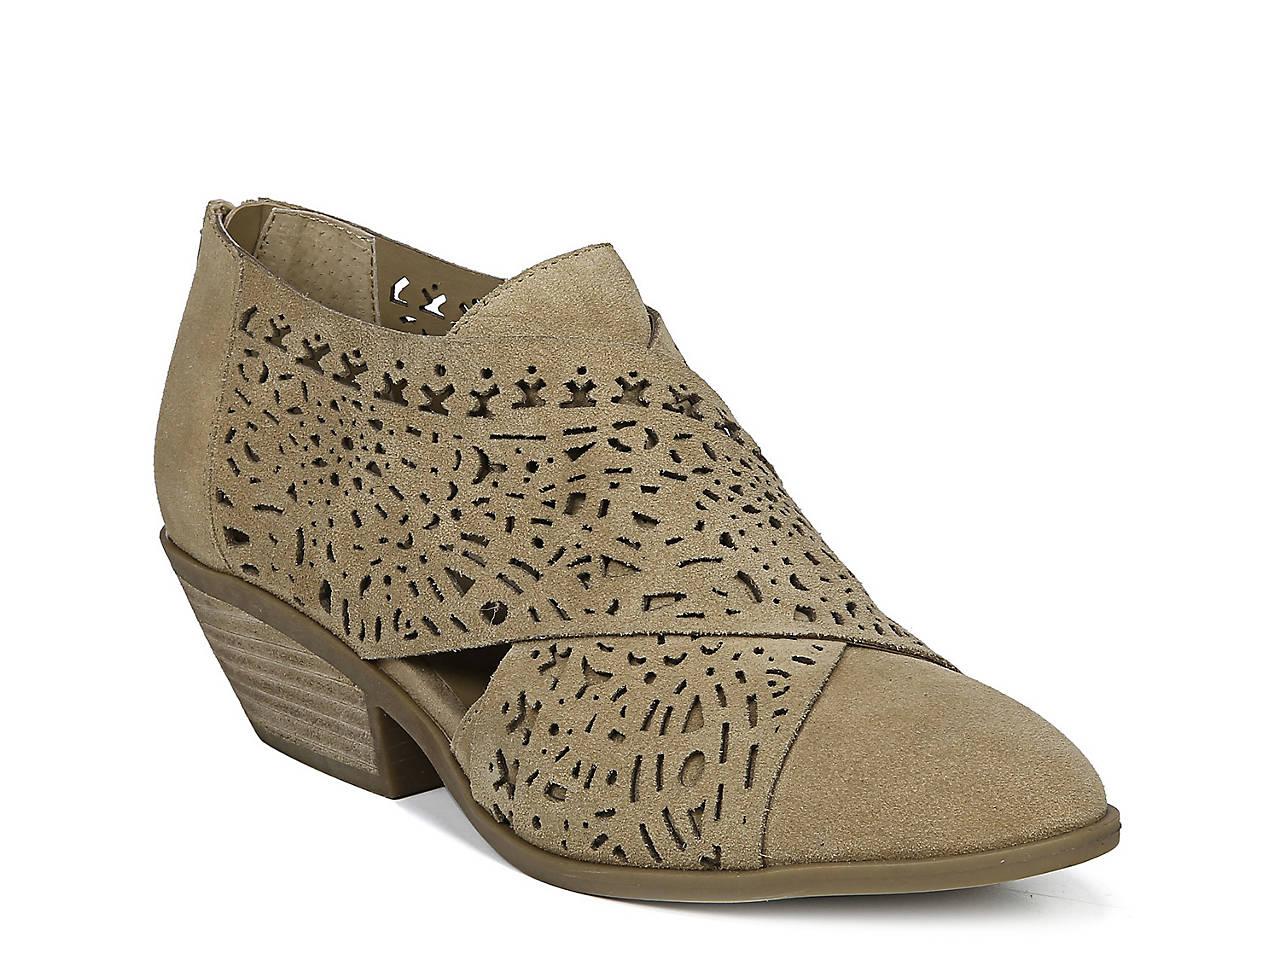 e97a2b6ac139 Carlos by Carlos Santana Miranda Bootie Women s Shoes